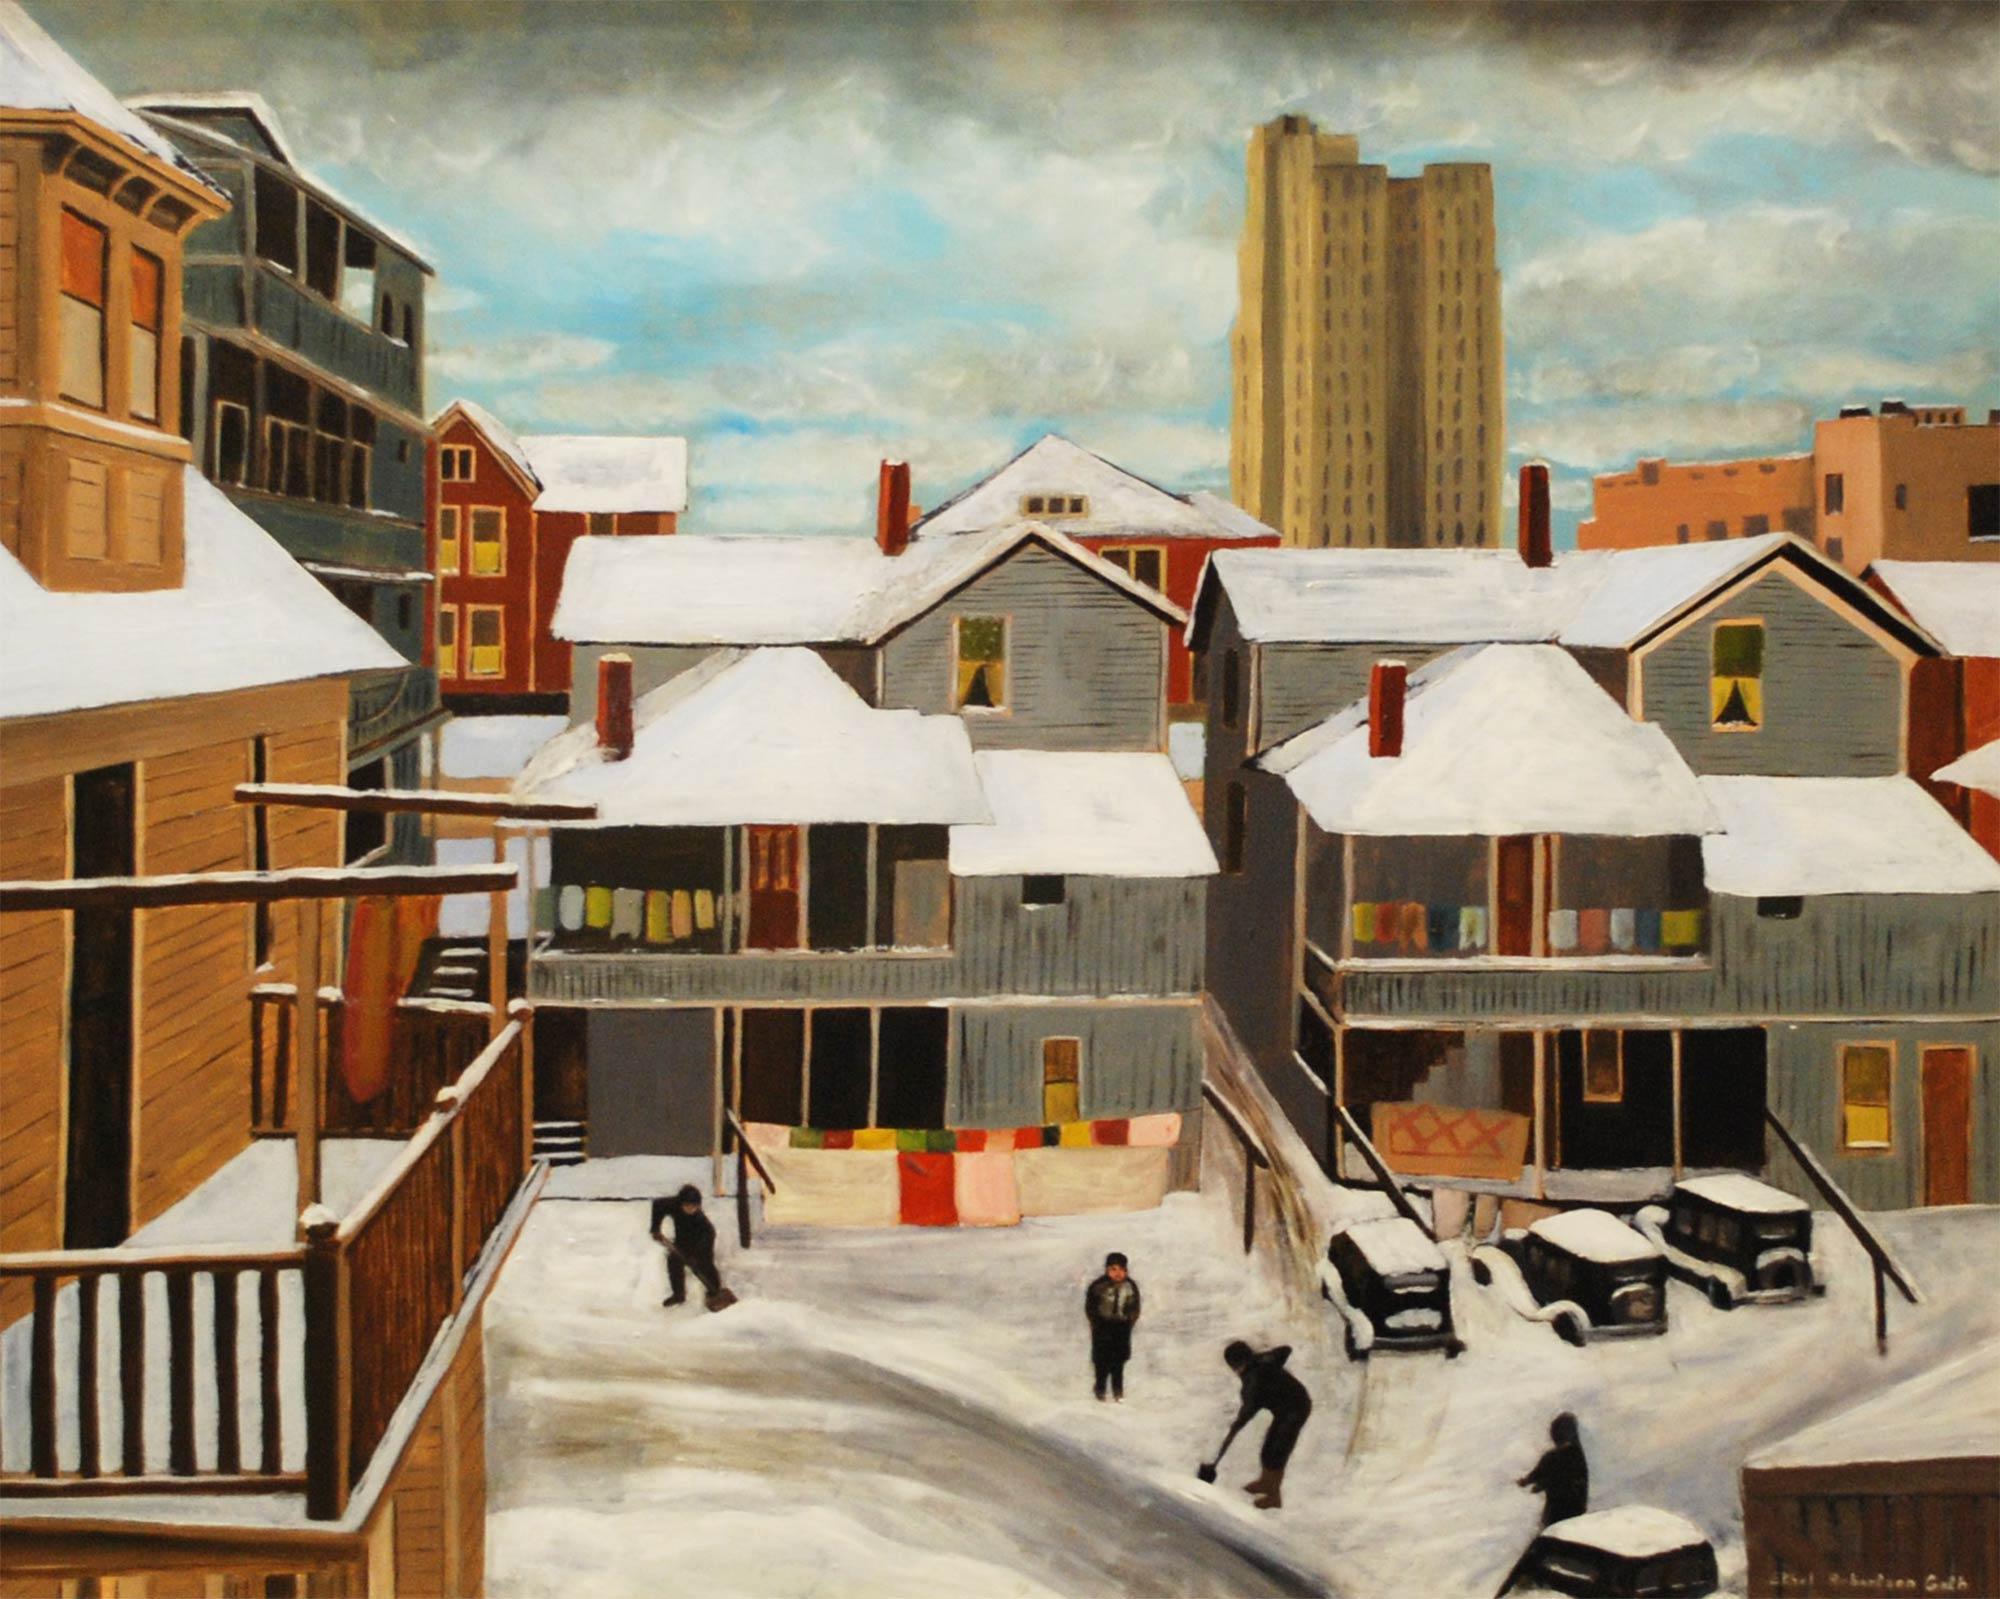 Ethel Robertson Gath, American, 1892–1972. Shoveling Snow, nd. Oil on Masonite, 23 7/8 x 29 7/8 in. Gift of Mr. F. L. Robertson, 1973.82